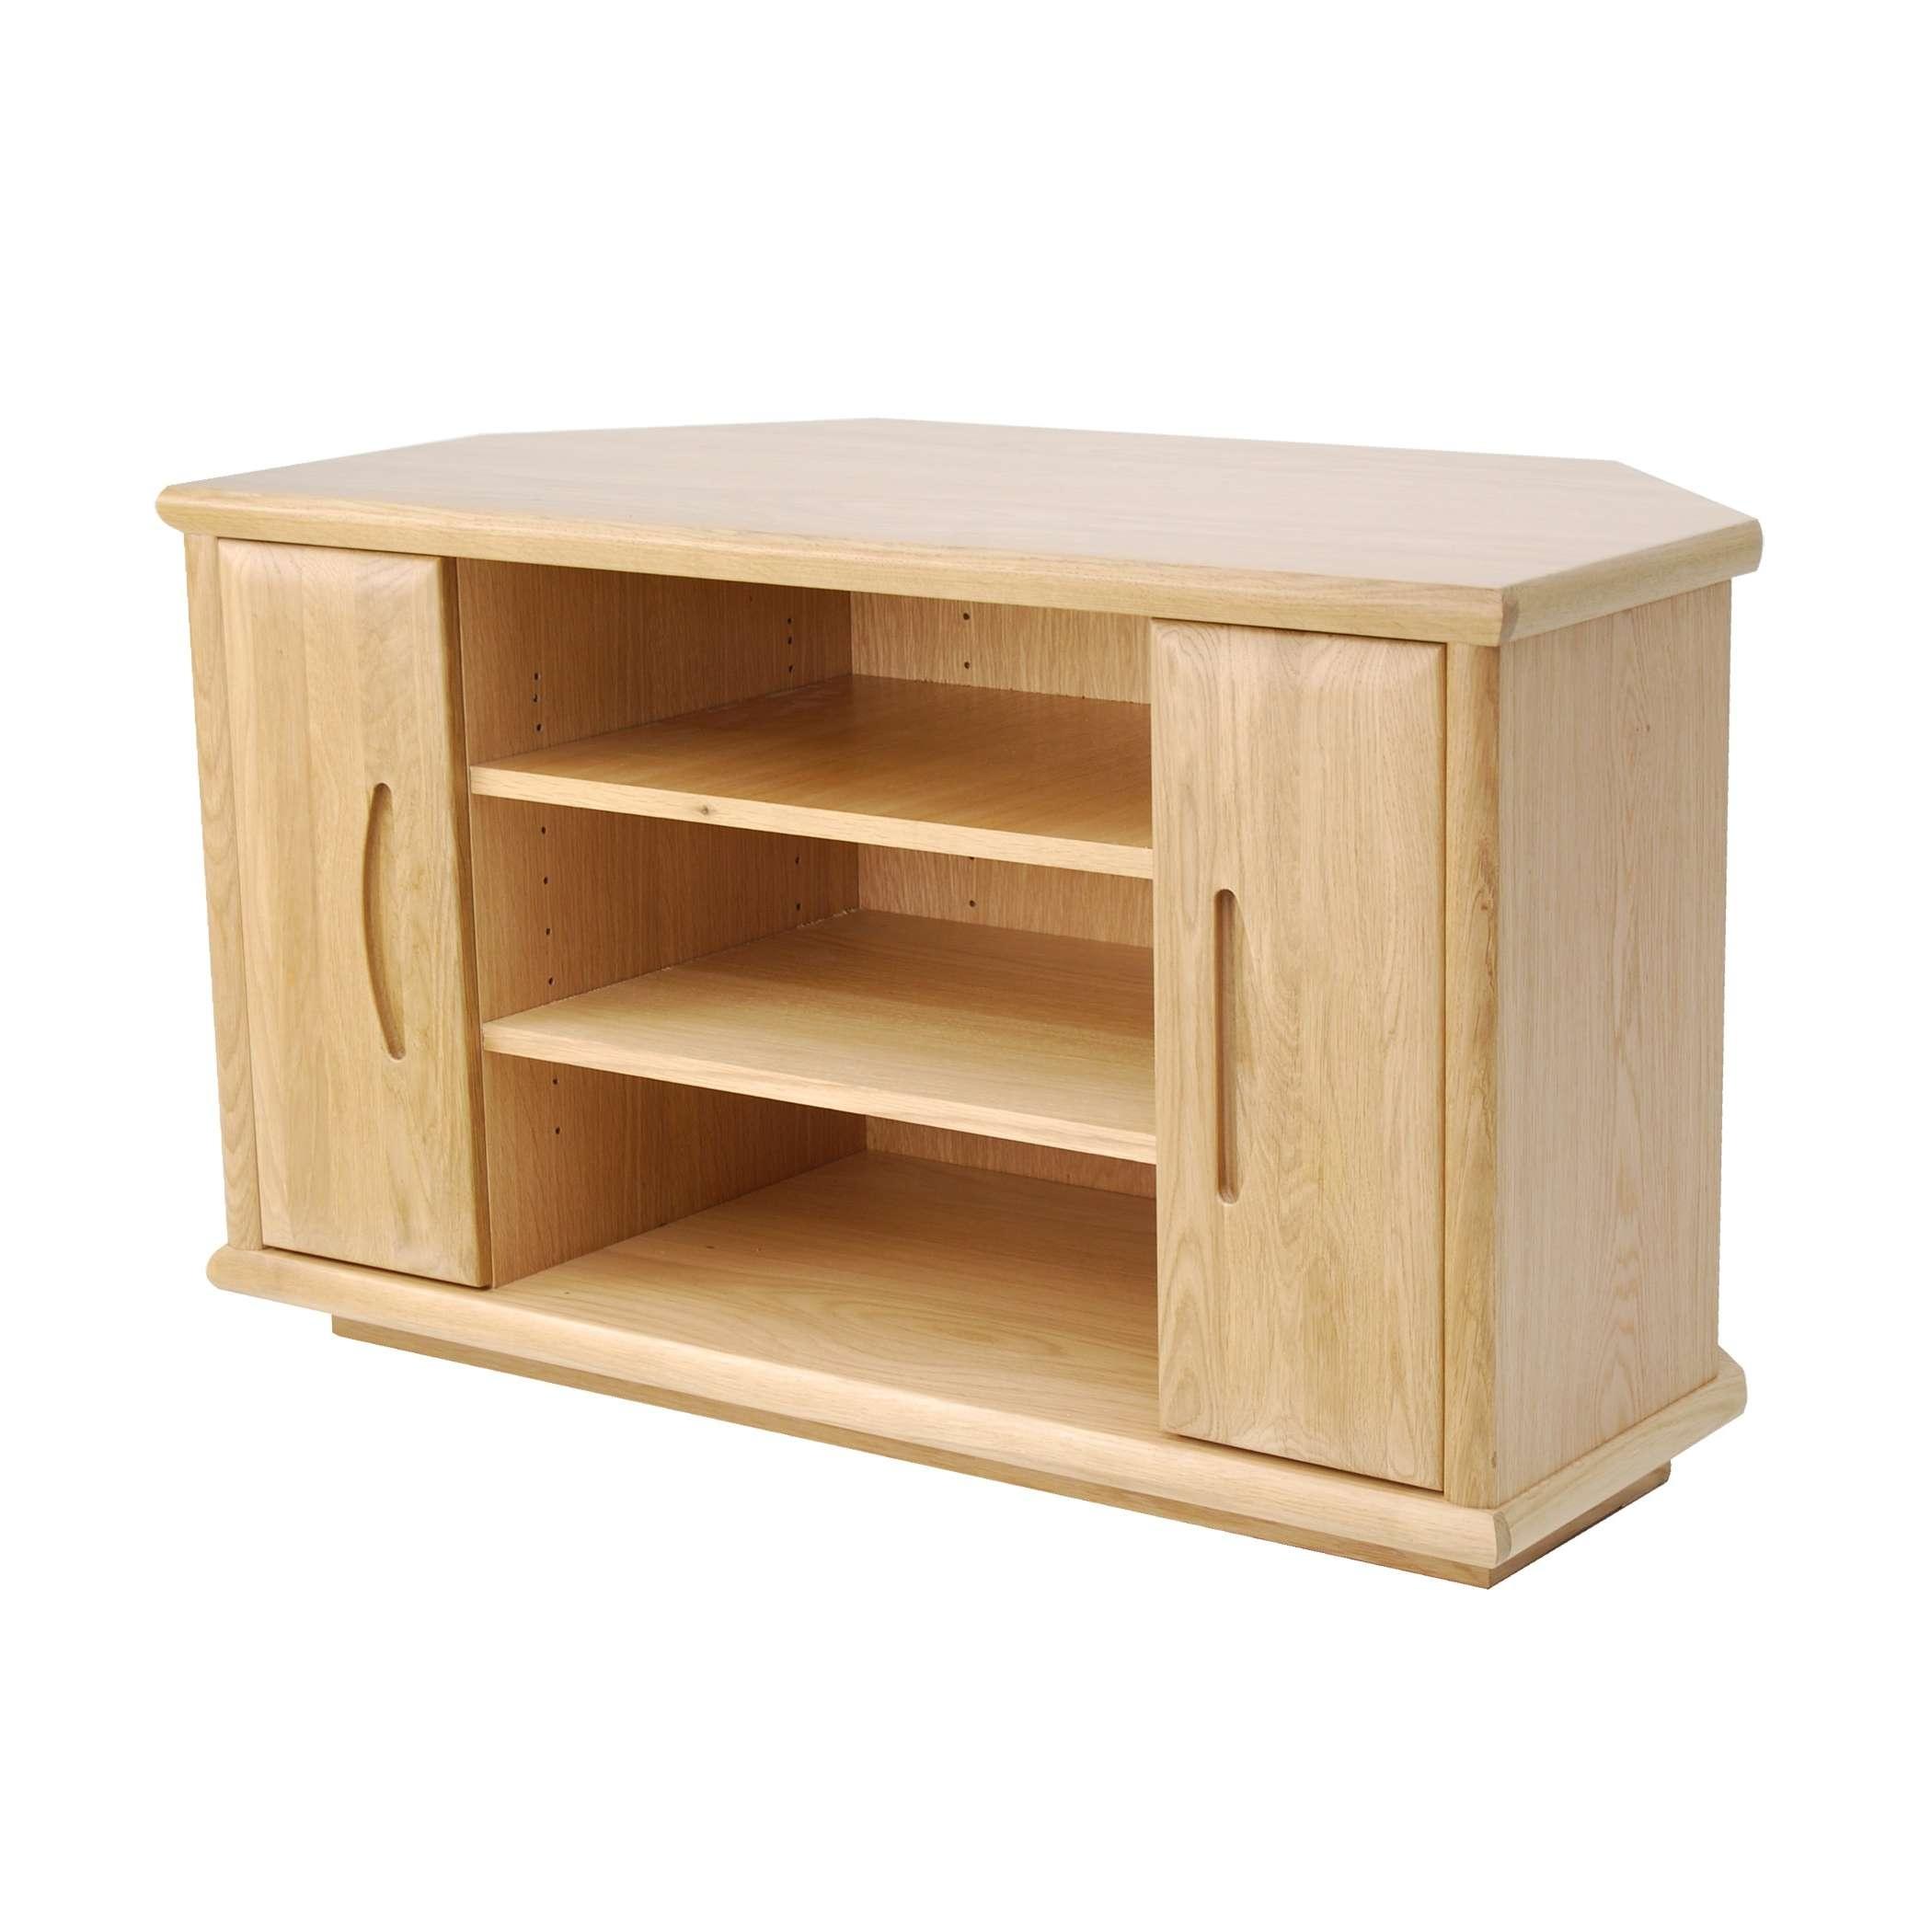 Oak Corner Tv Stand | Gola Furniture Uk Intended For Dark Wood Corner Tv Cabinets (View 12 of 20)